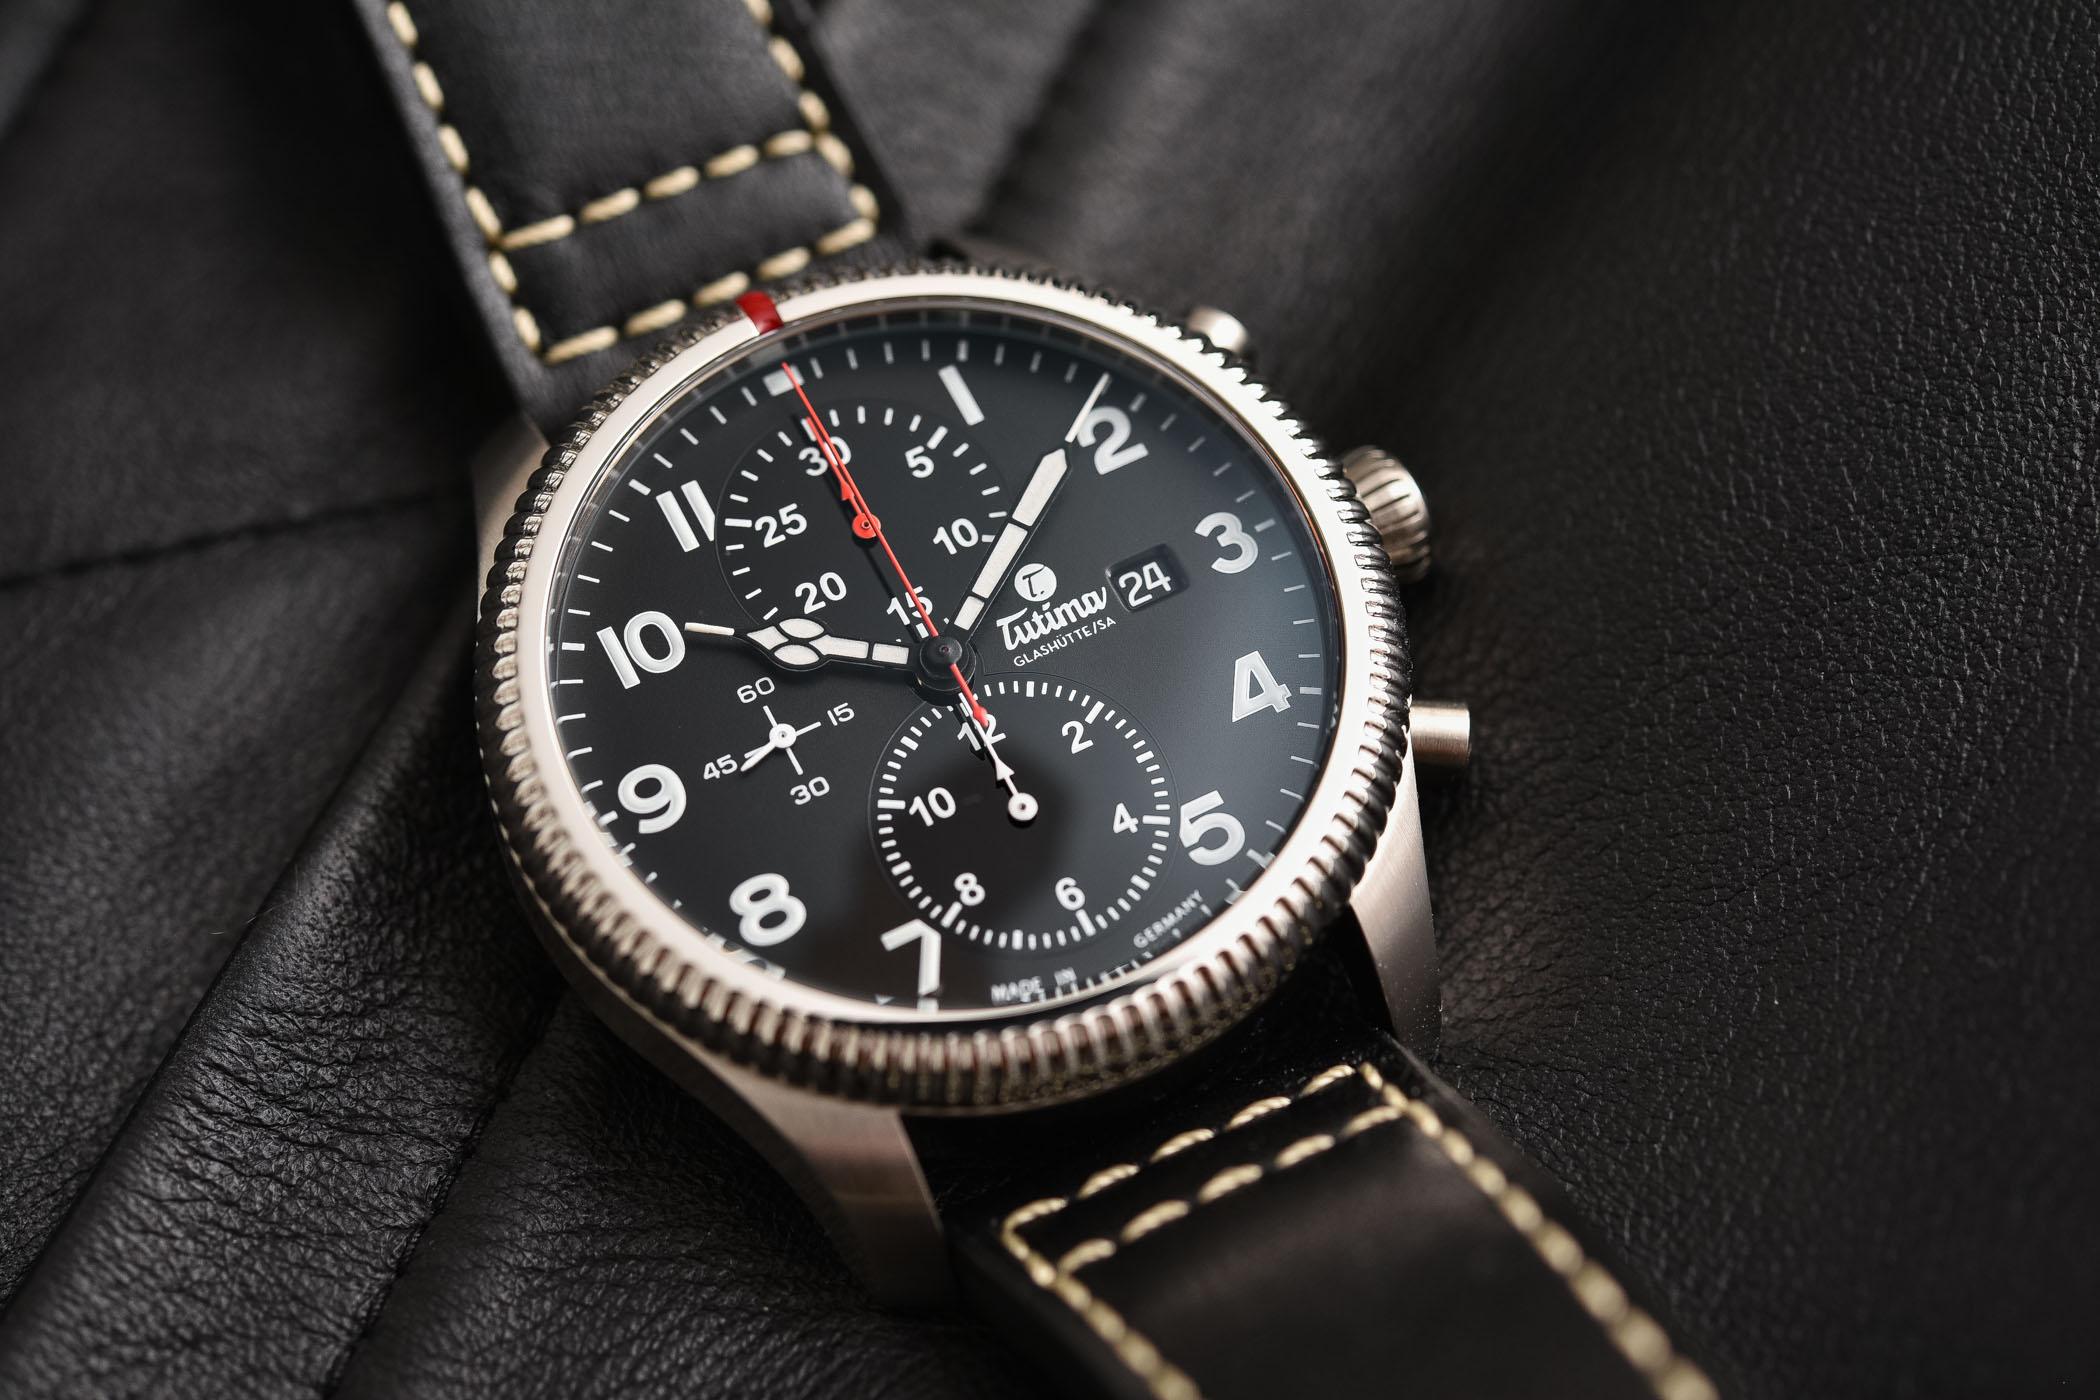 Tutima Grand Flieger Classic Chronograph